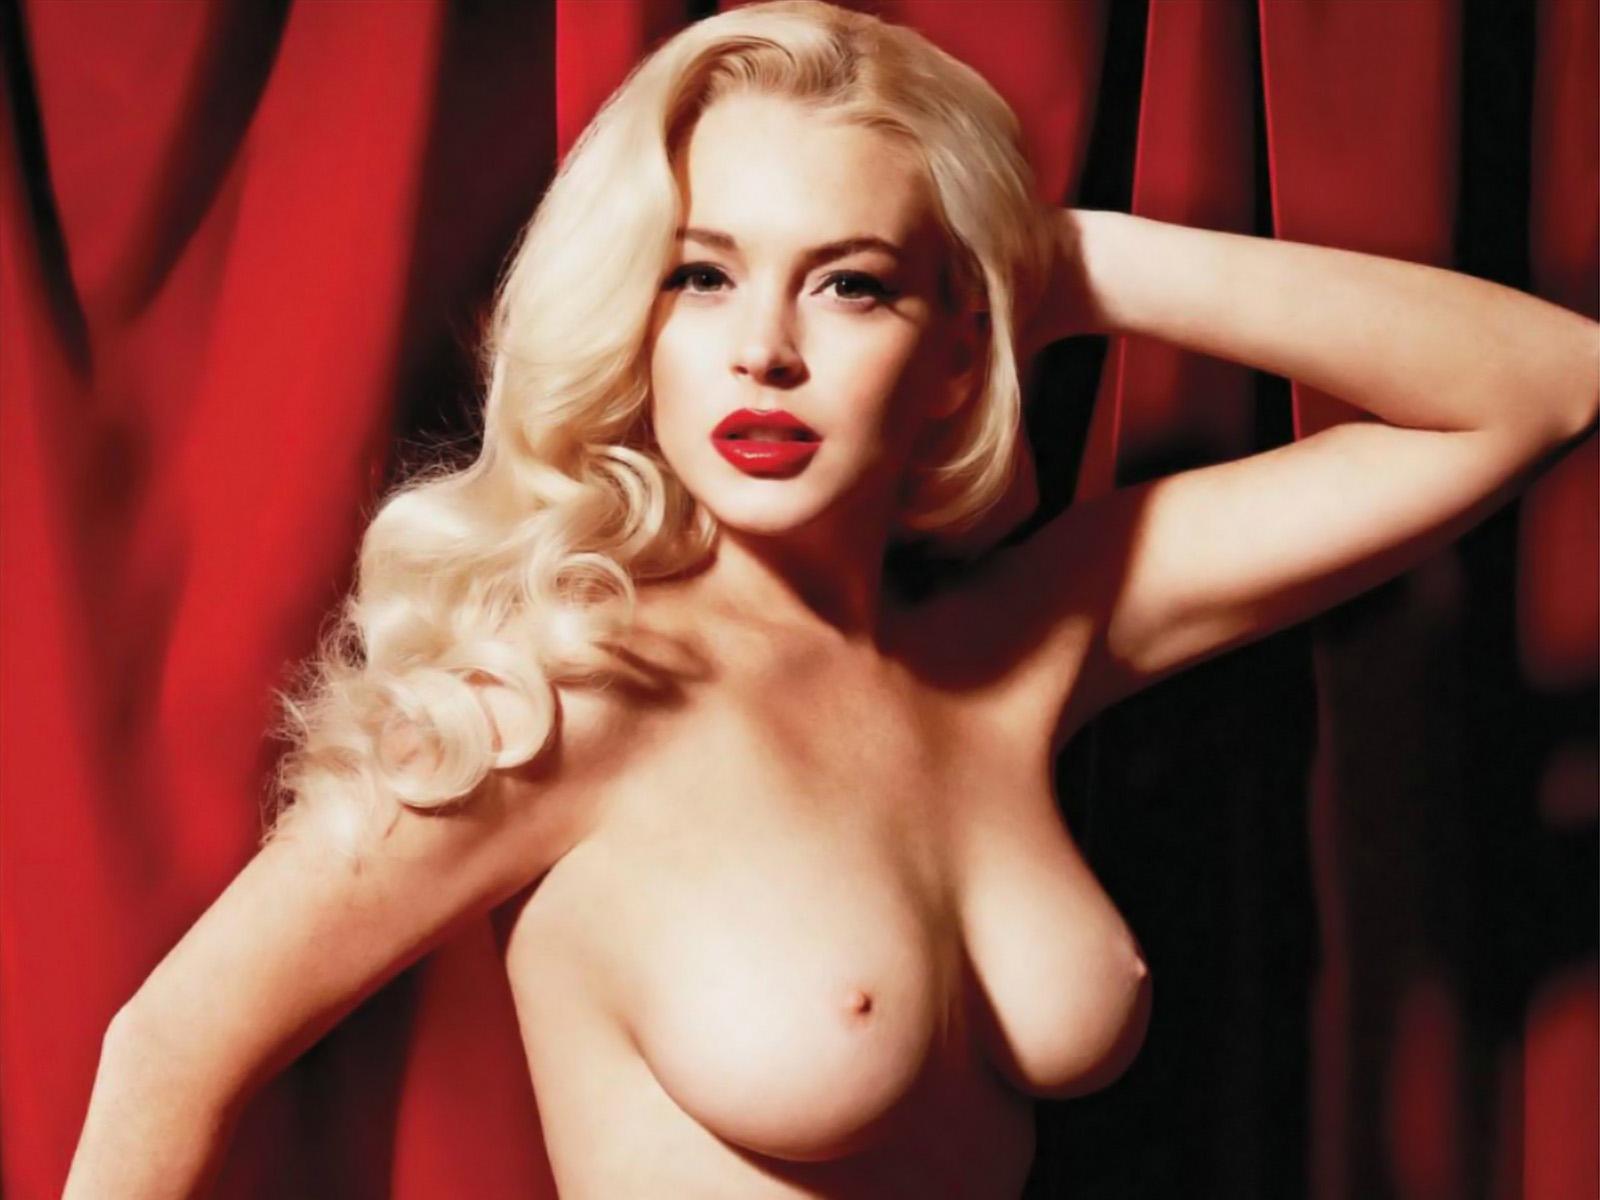 http://3.bp.blogspot.com/-4a9eUhFrVQM/TuLuntOeI1I/AAAAAAAADOk/jZ3tiTVwK9M/s1600/Lindsay+Lohan+naked+Playboy+Magazine+cover+girl+January+2012+7+12xUHQ.jpg